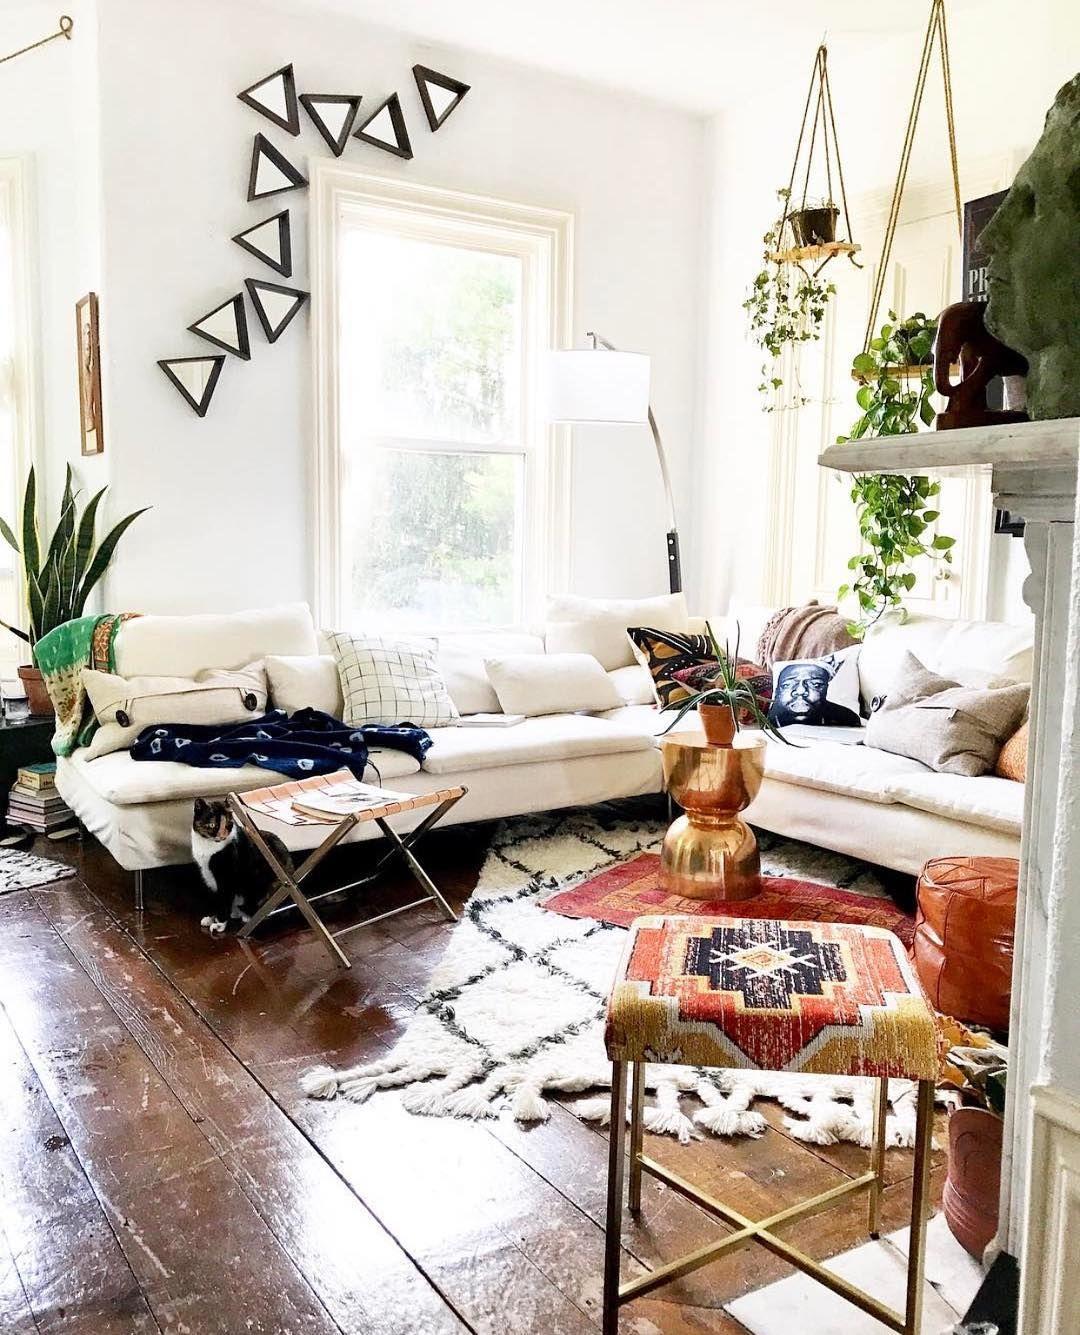 Diagonal Rug Dawnelle Kirsten Dkrenewal On Instagram Via Kara Evans Dream Decor Home Decor Beautiful Living Rooms